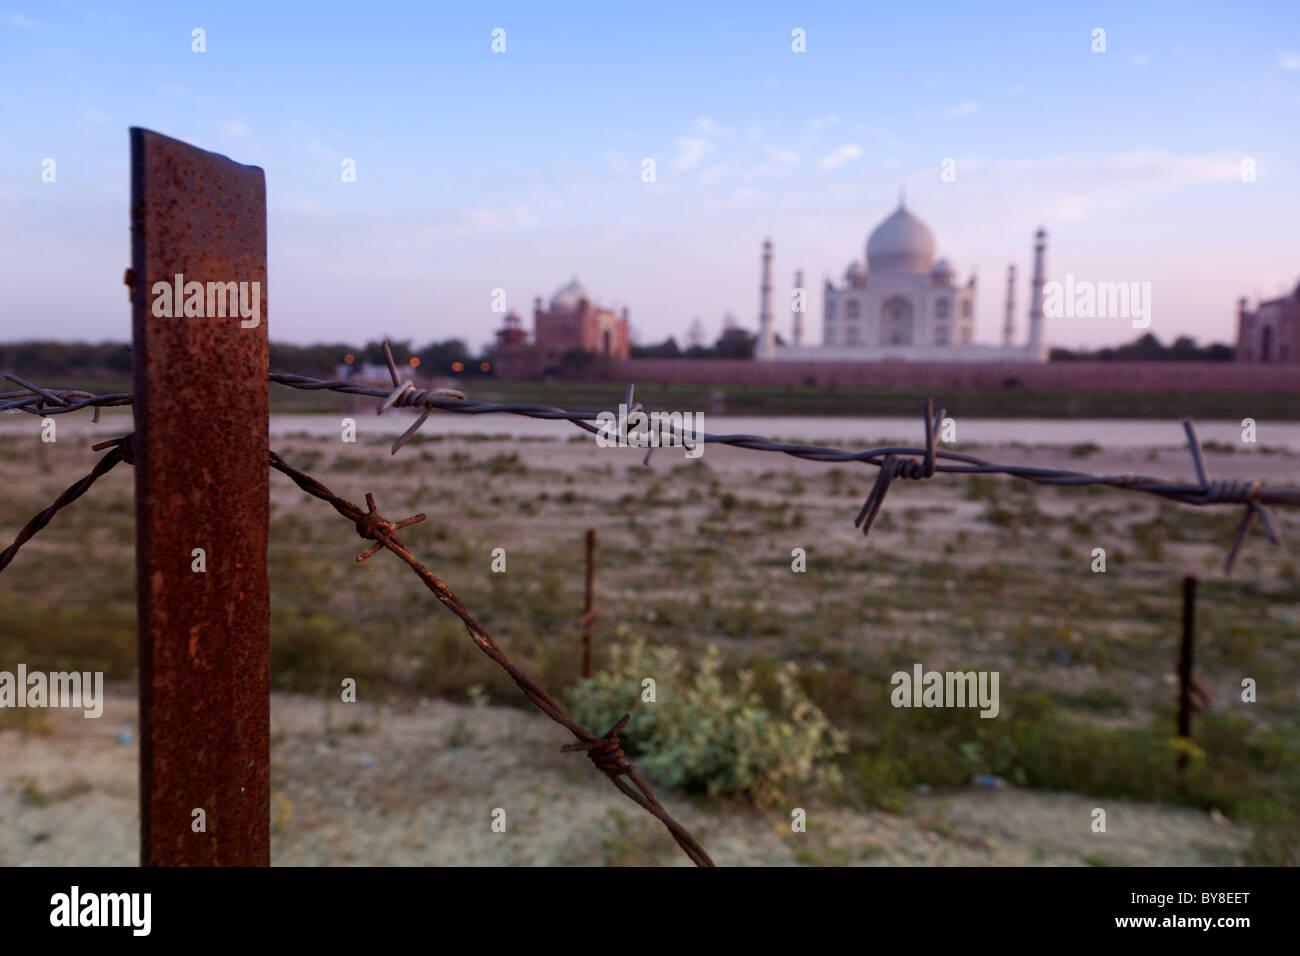 India, Uttar Pradesh, Agra, barbed wire fencing on security fence near Taj Mahal - Stock Image